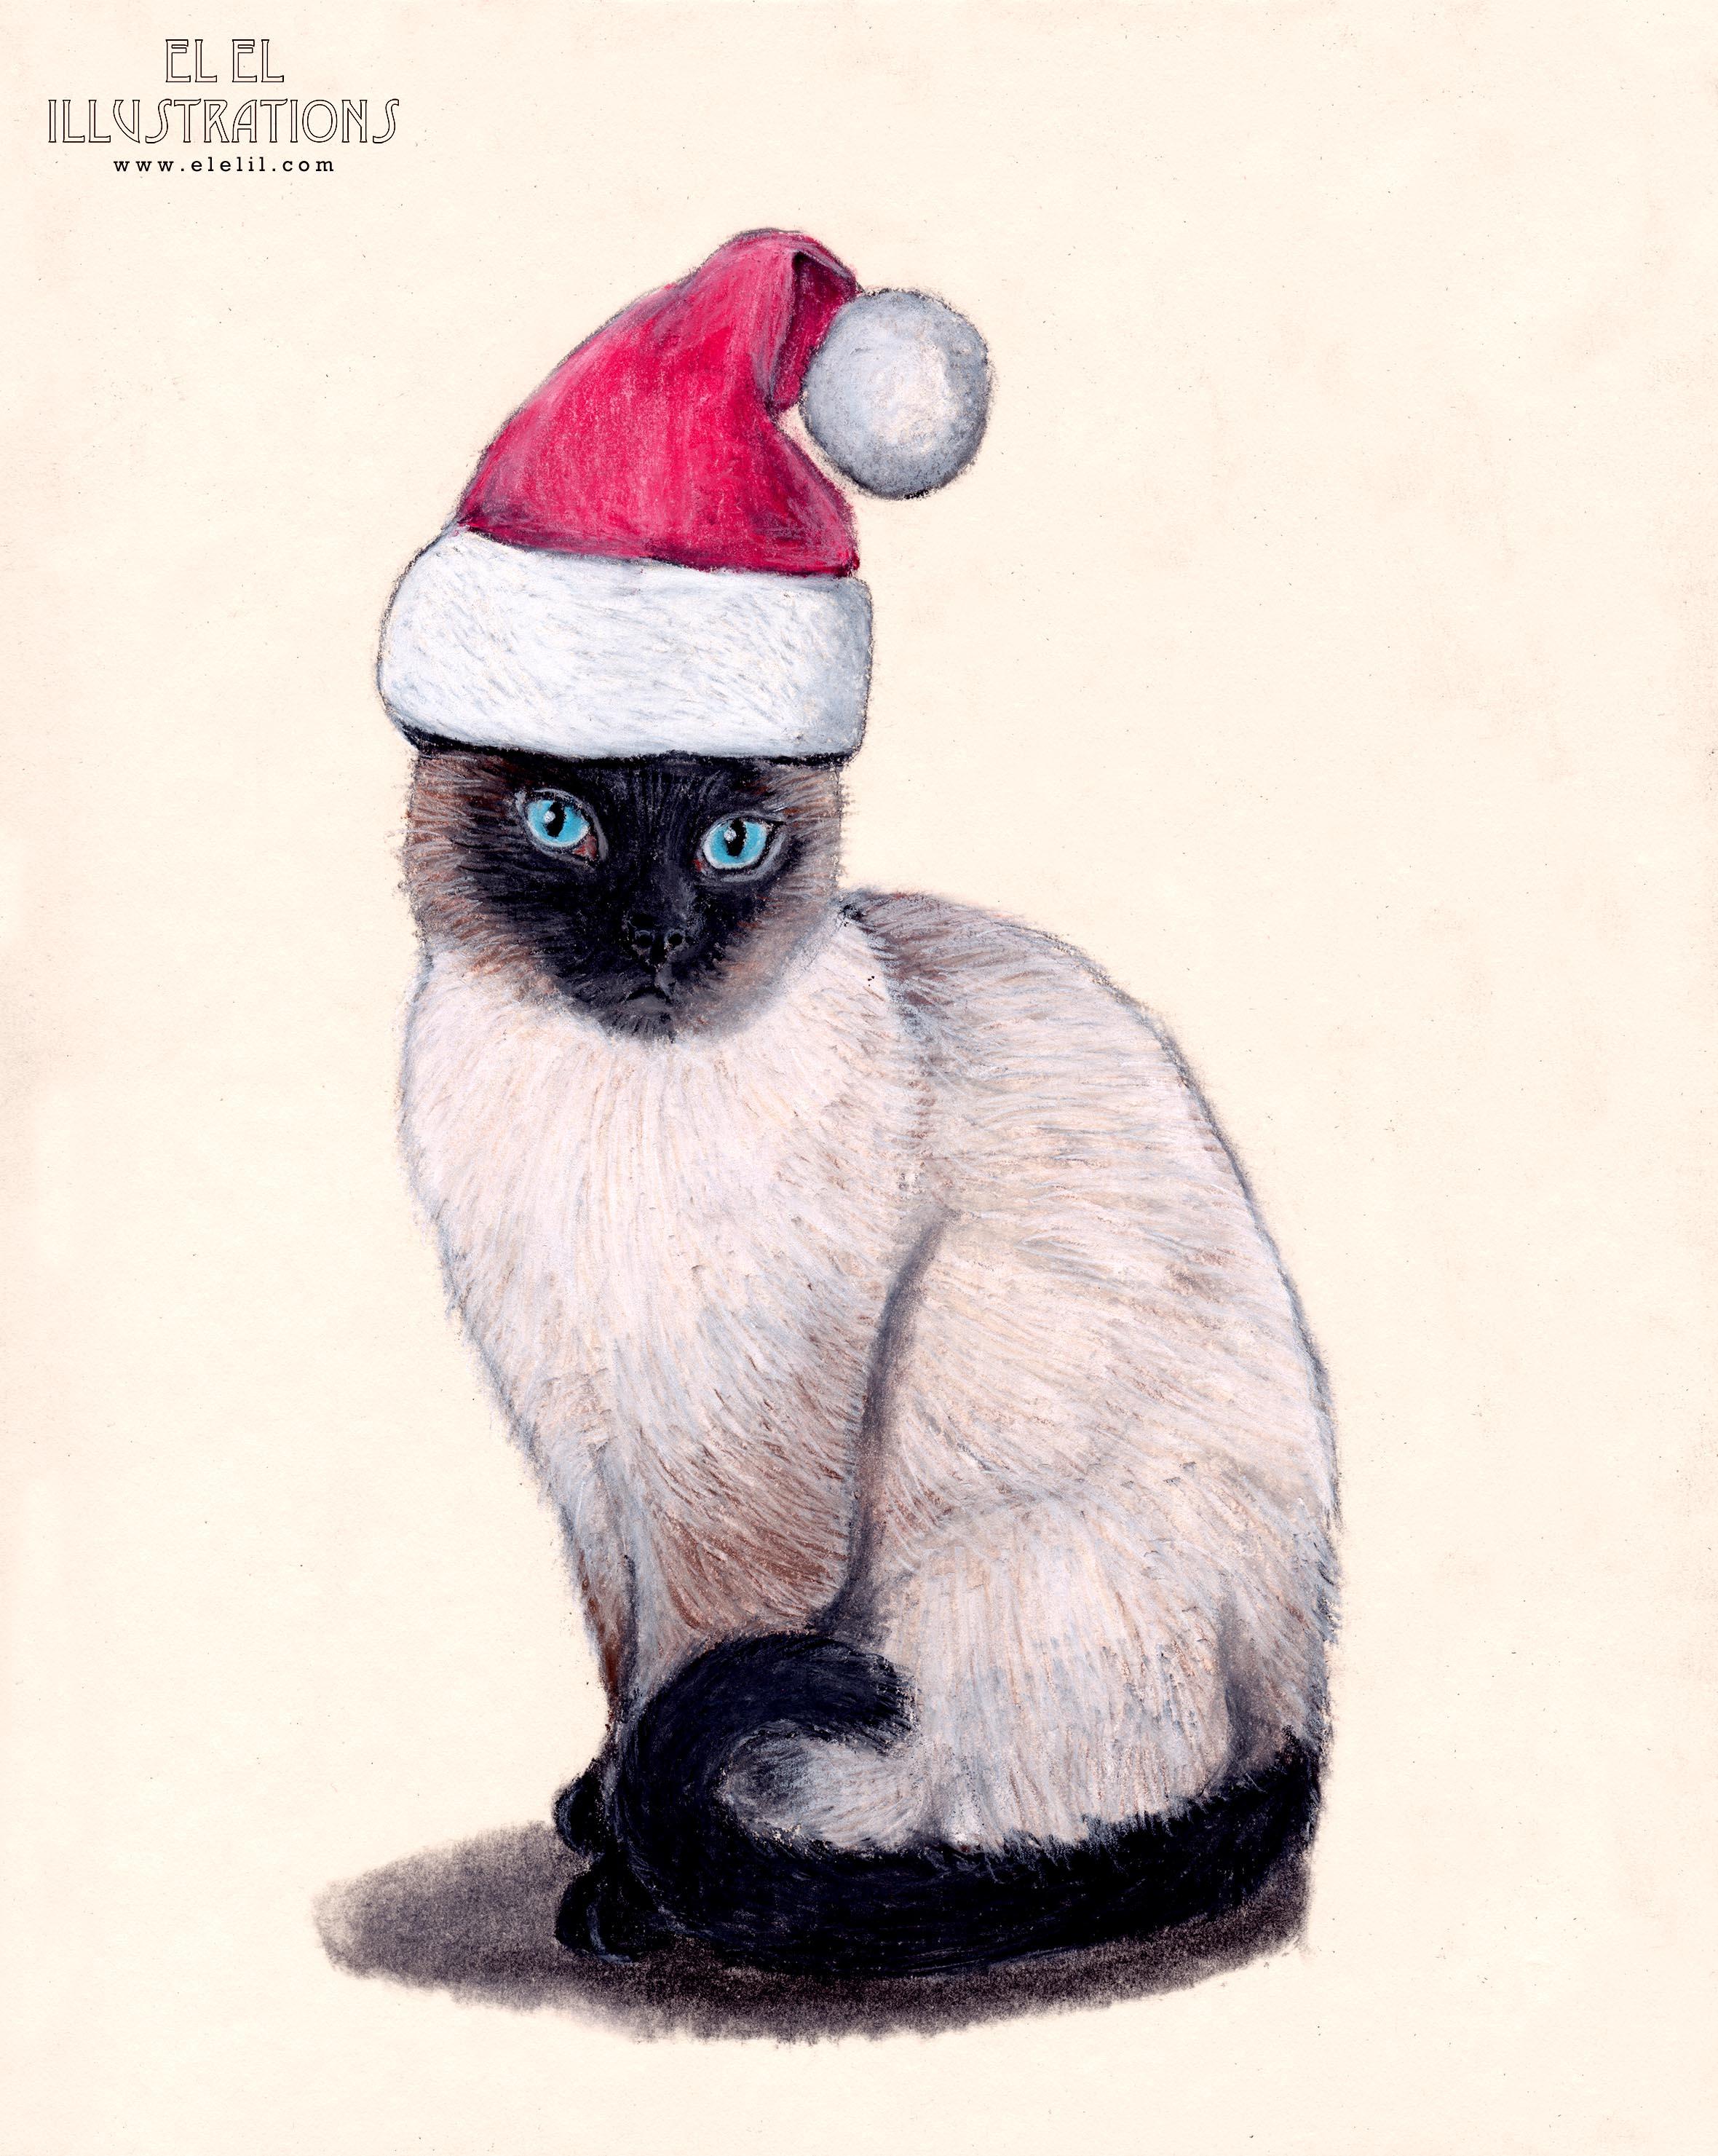 holiday_cat_christmas_wm.jpg